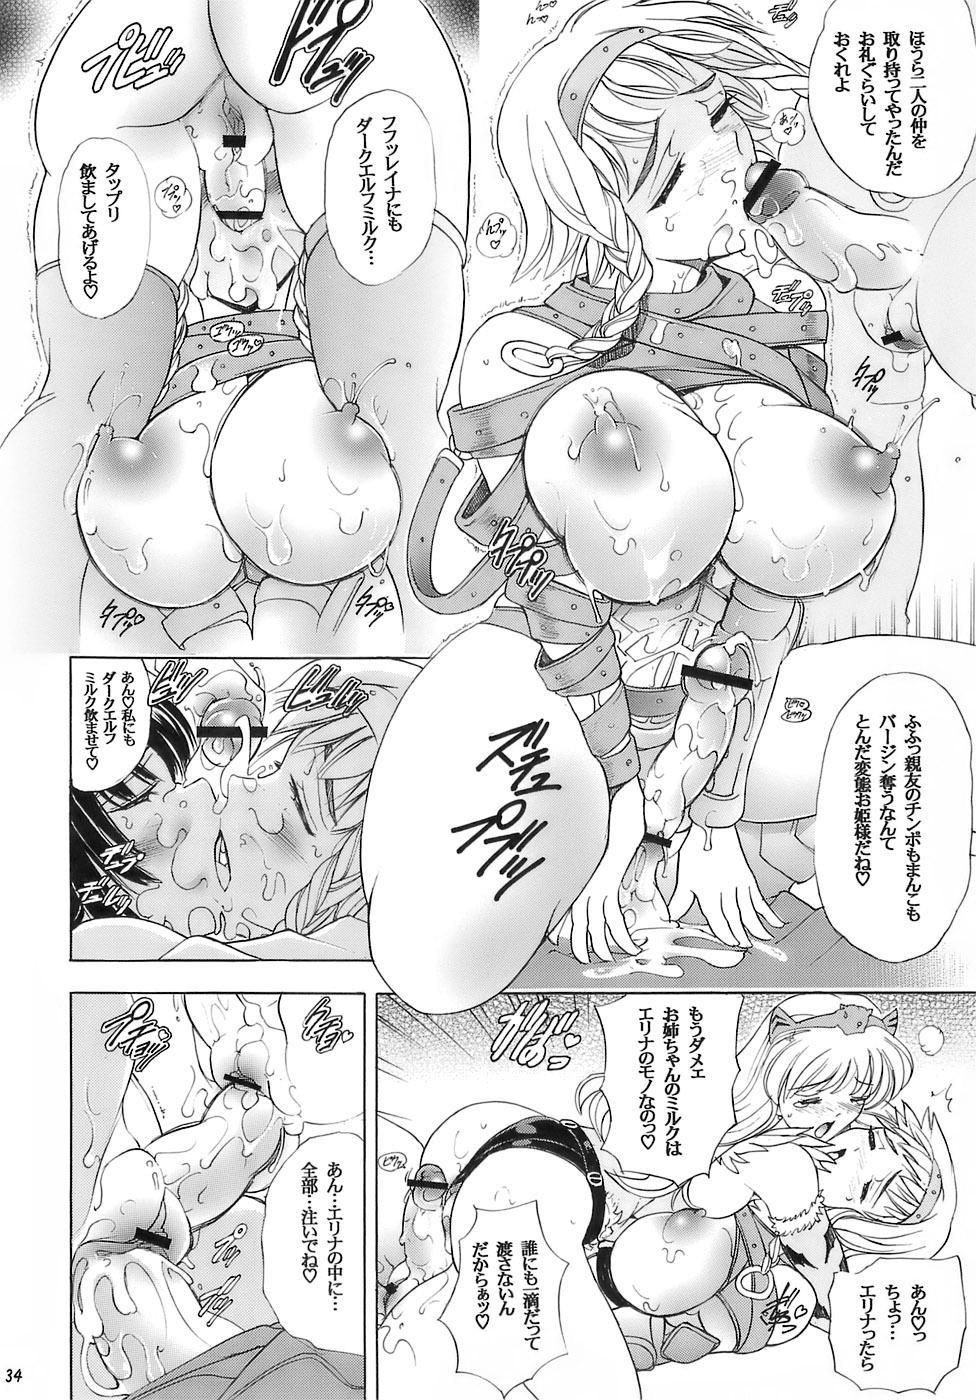 (C71) [Kawaraya Honpo (Kawaraya A-ta)] Hana - Maki no Juusan - Hana no Sumeragi (Queen's Blade) 33